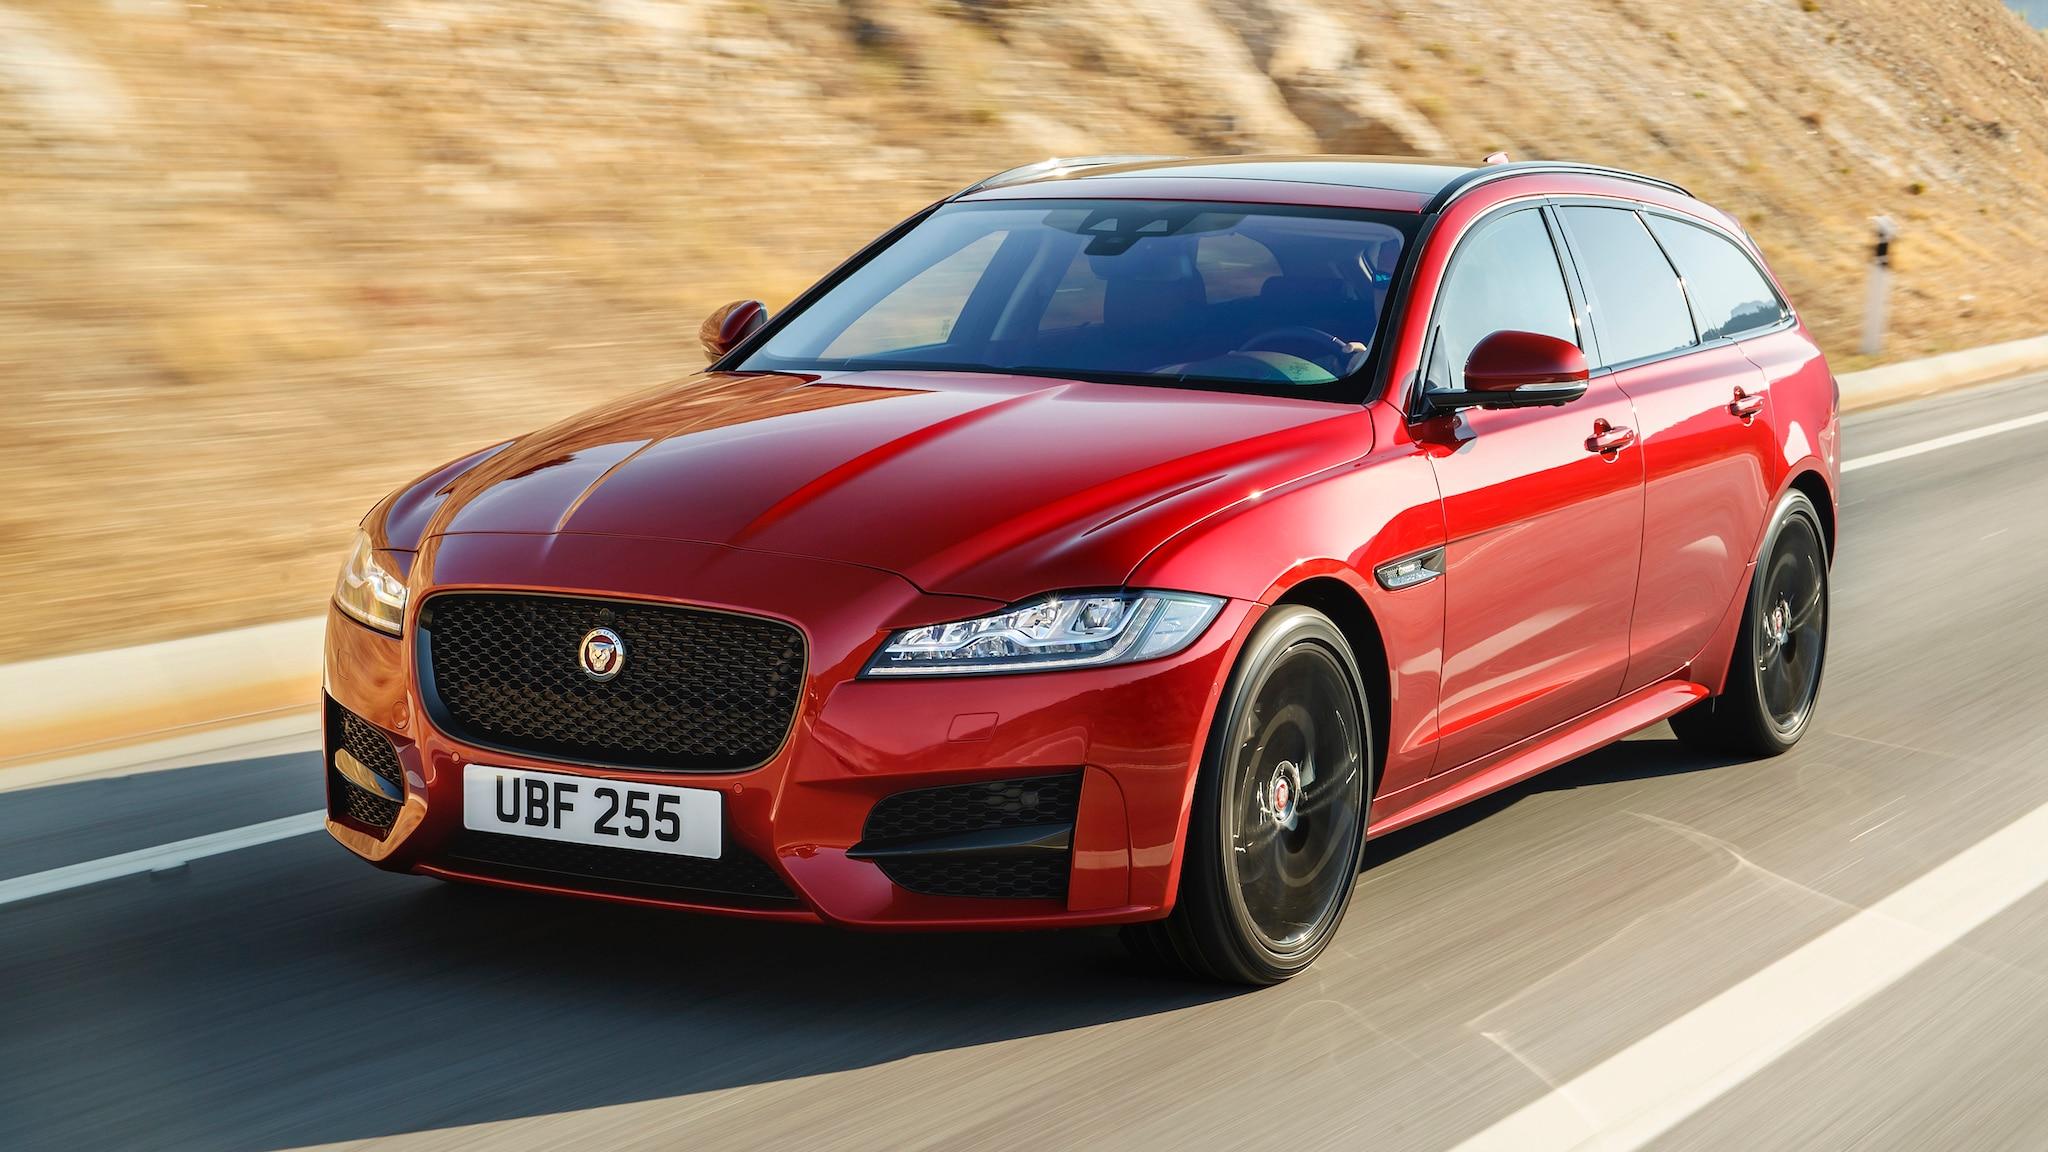 Jaguar XF Sportbrake Wagons Now Have $20,000 Discounts (or More!) - Automobile